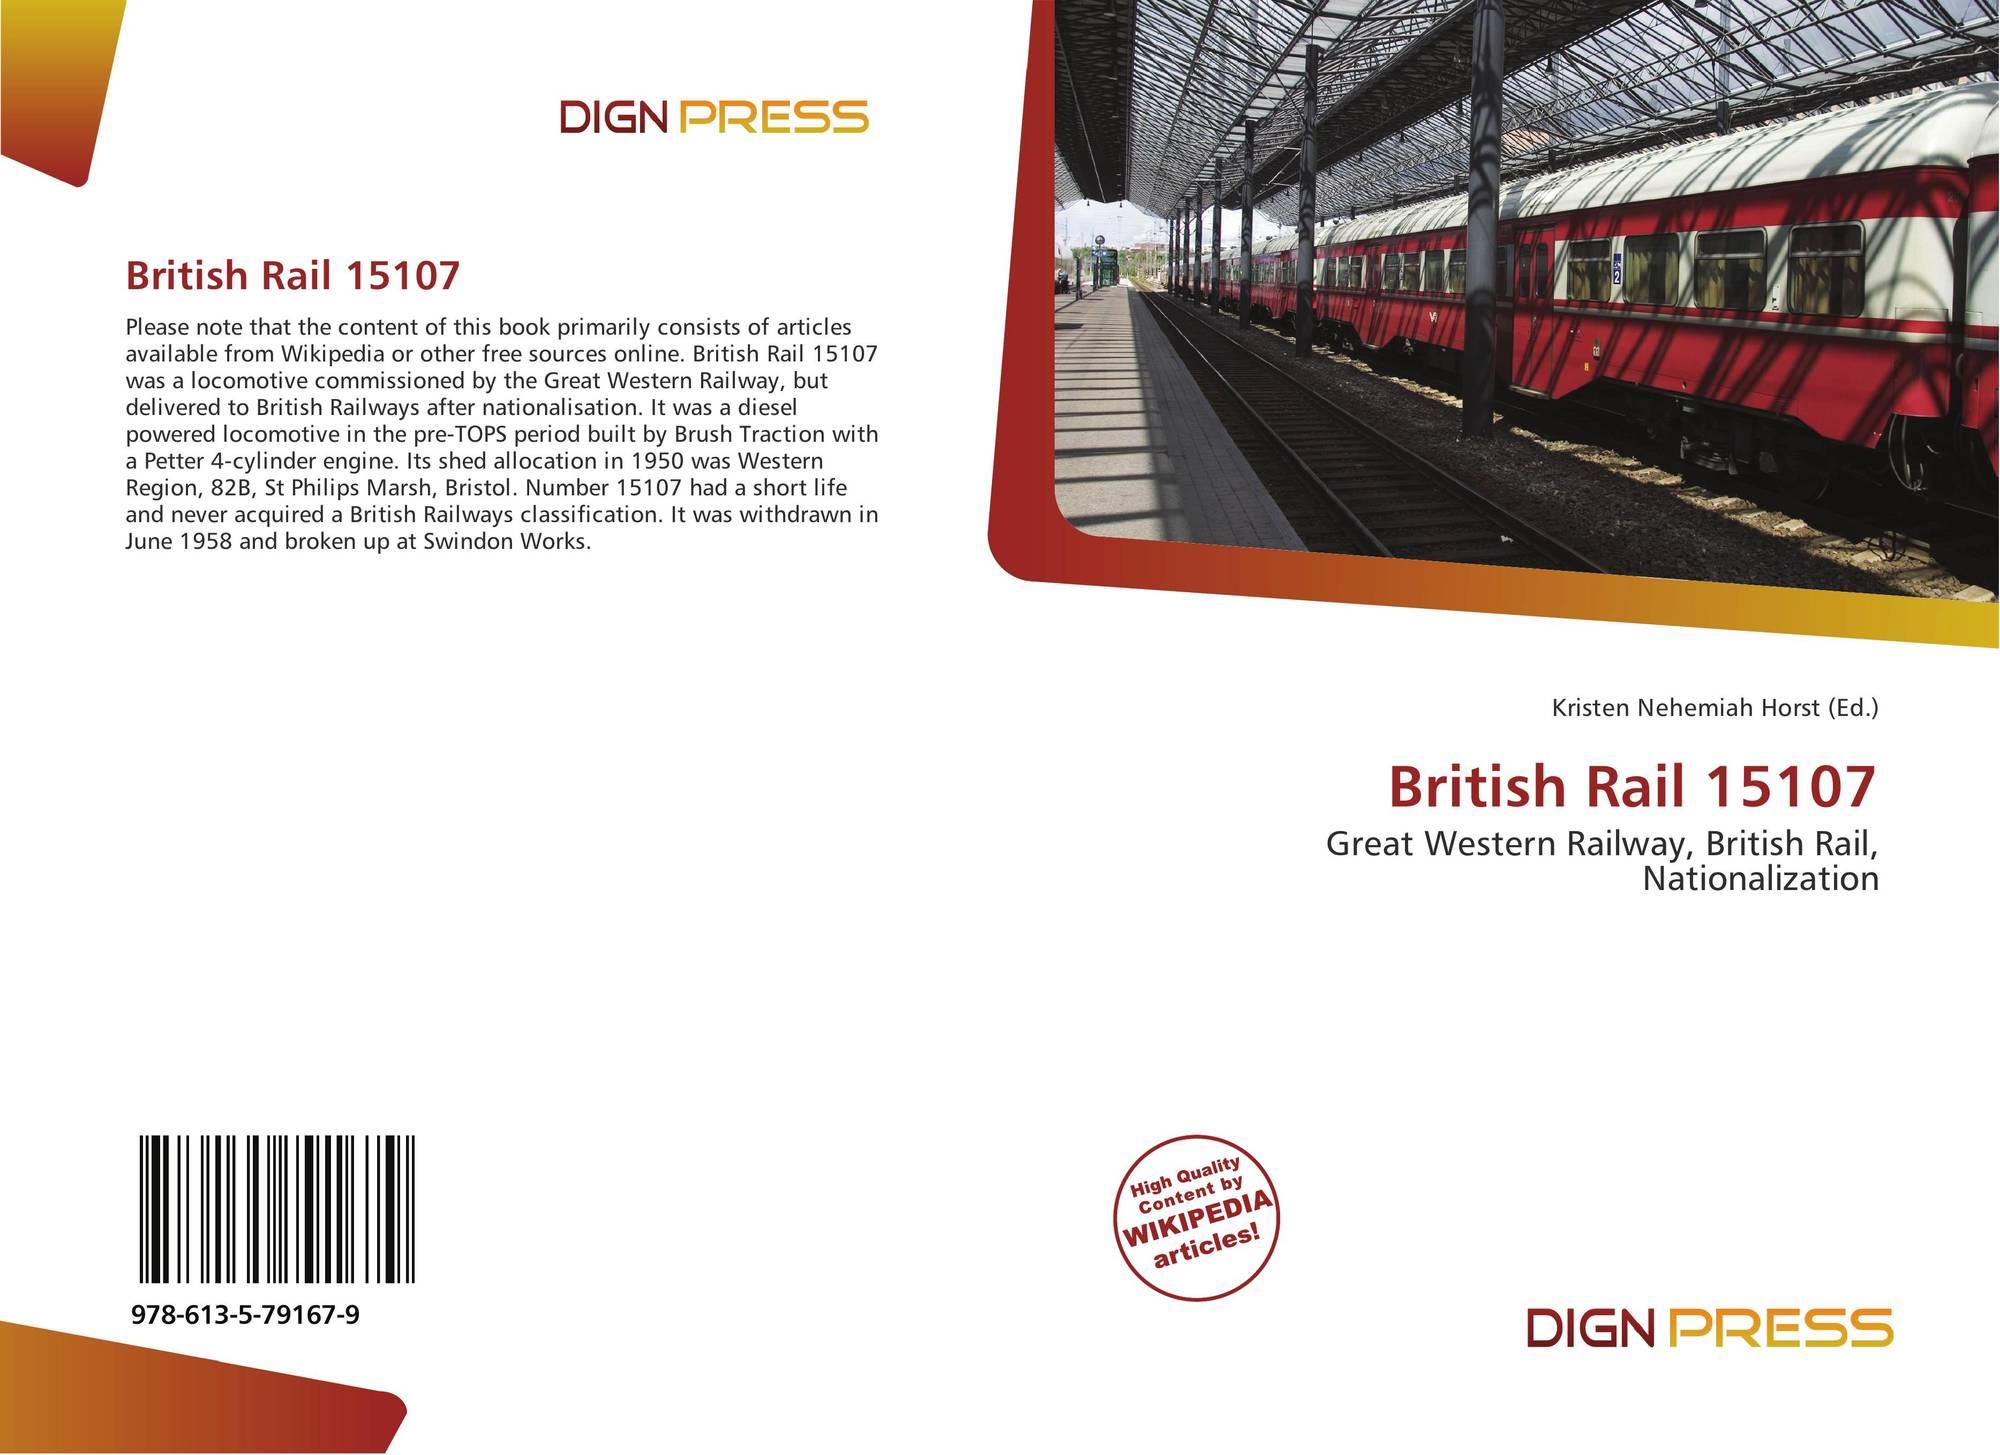 British Rail 15107, 978-613-5-79167-9, 6135791672 ,9786135791679